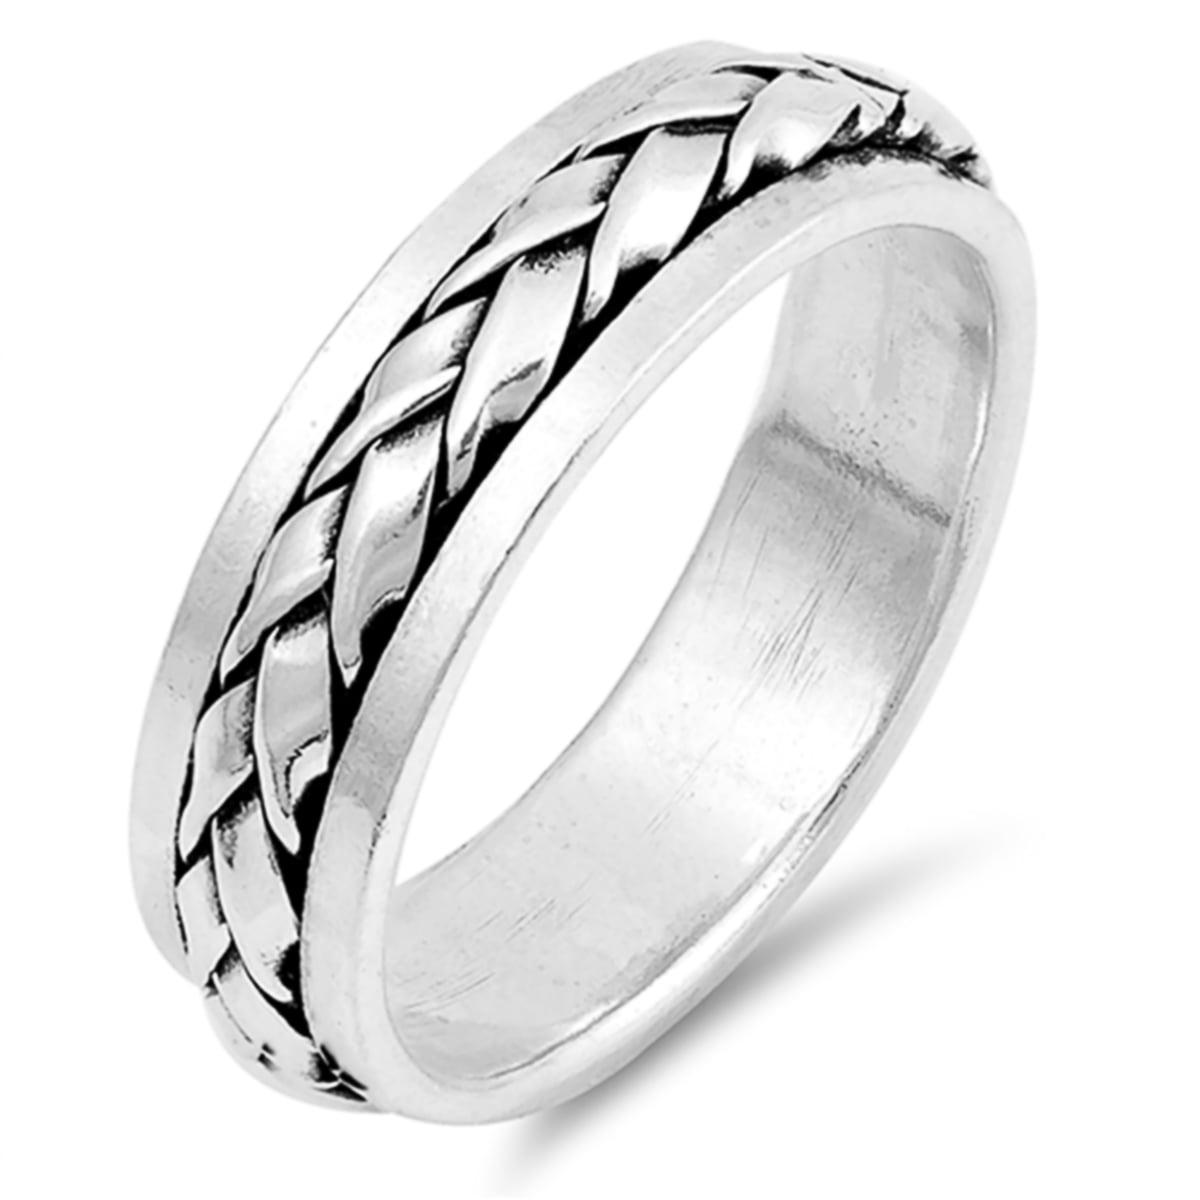 Sterling Silver Spinner Ring 6mm